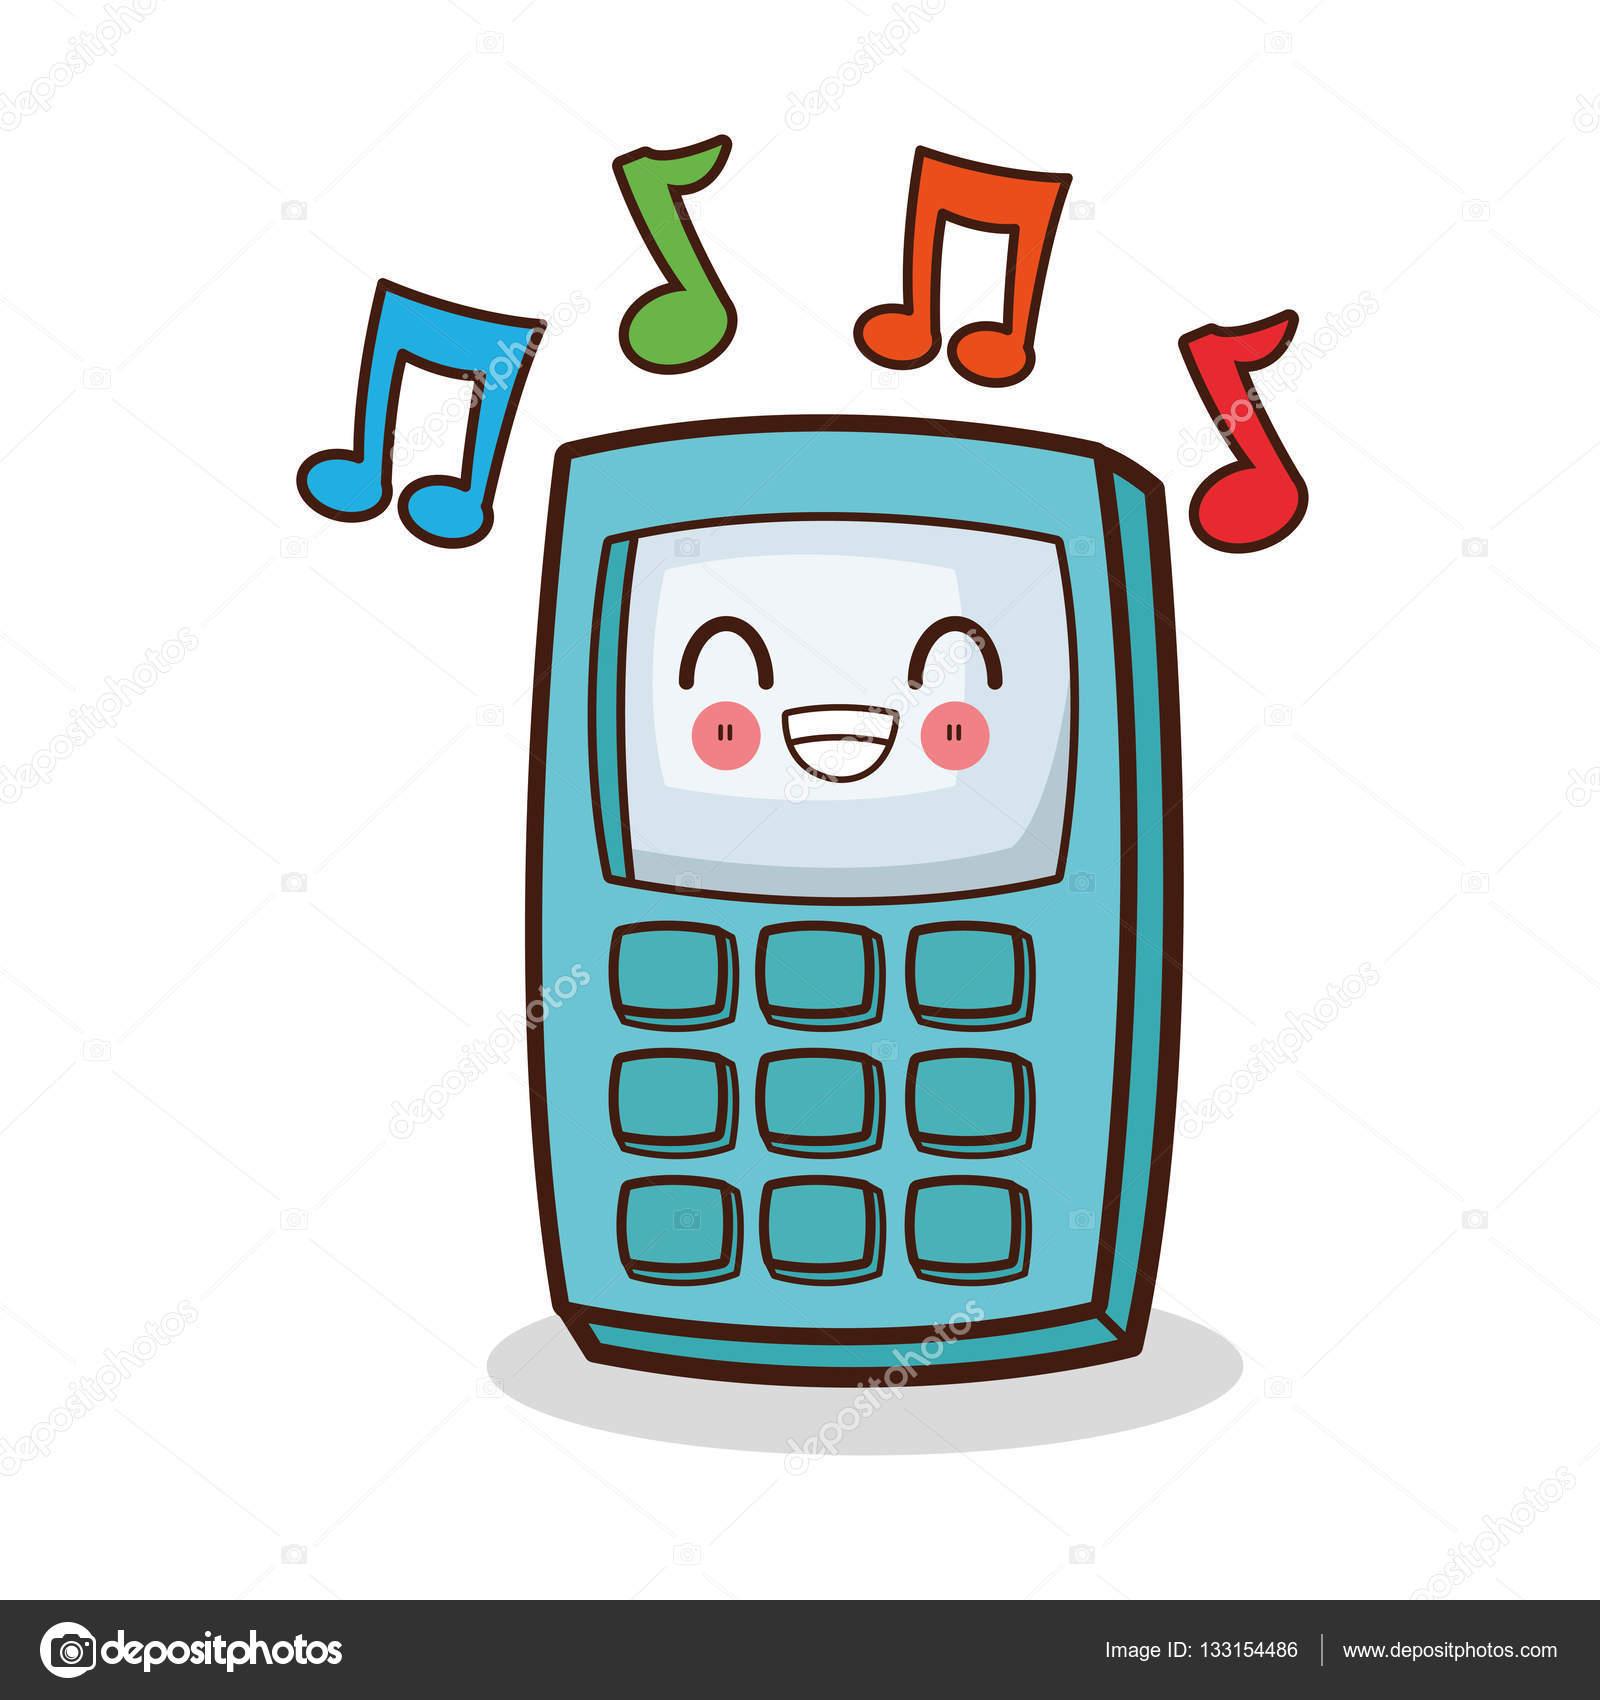 conception de t l phone portable kawaii isol image vectorielle jemastock 133154486. Black Bedroom Furniture Sets. Home Design Ideas